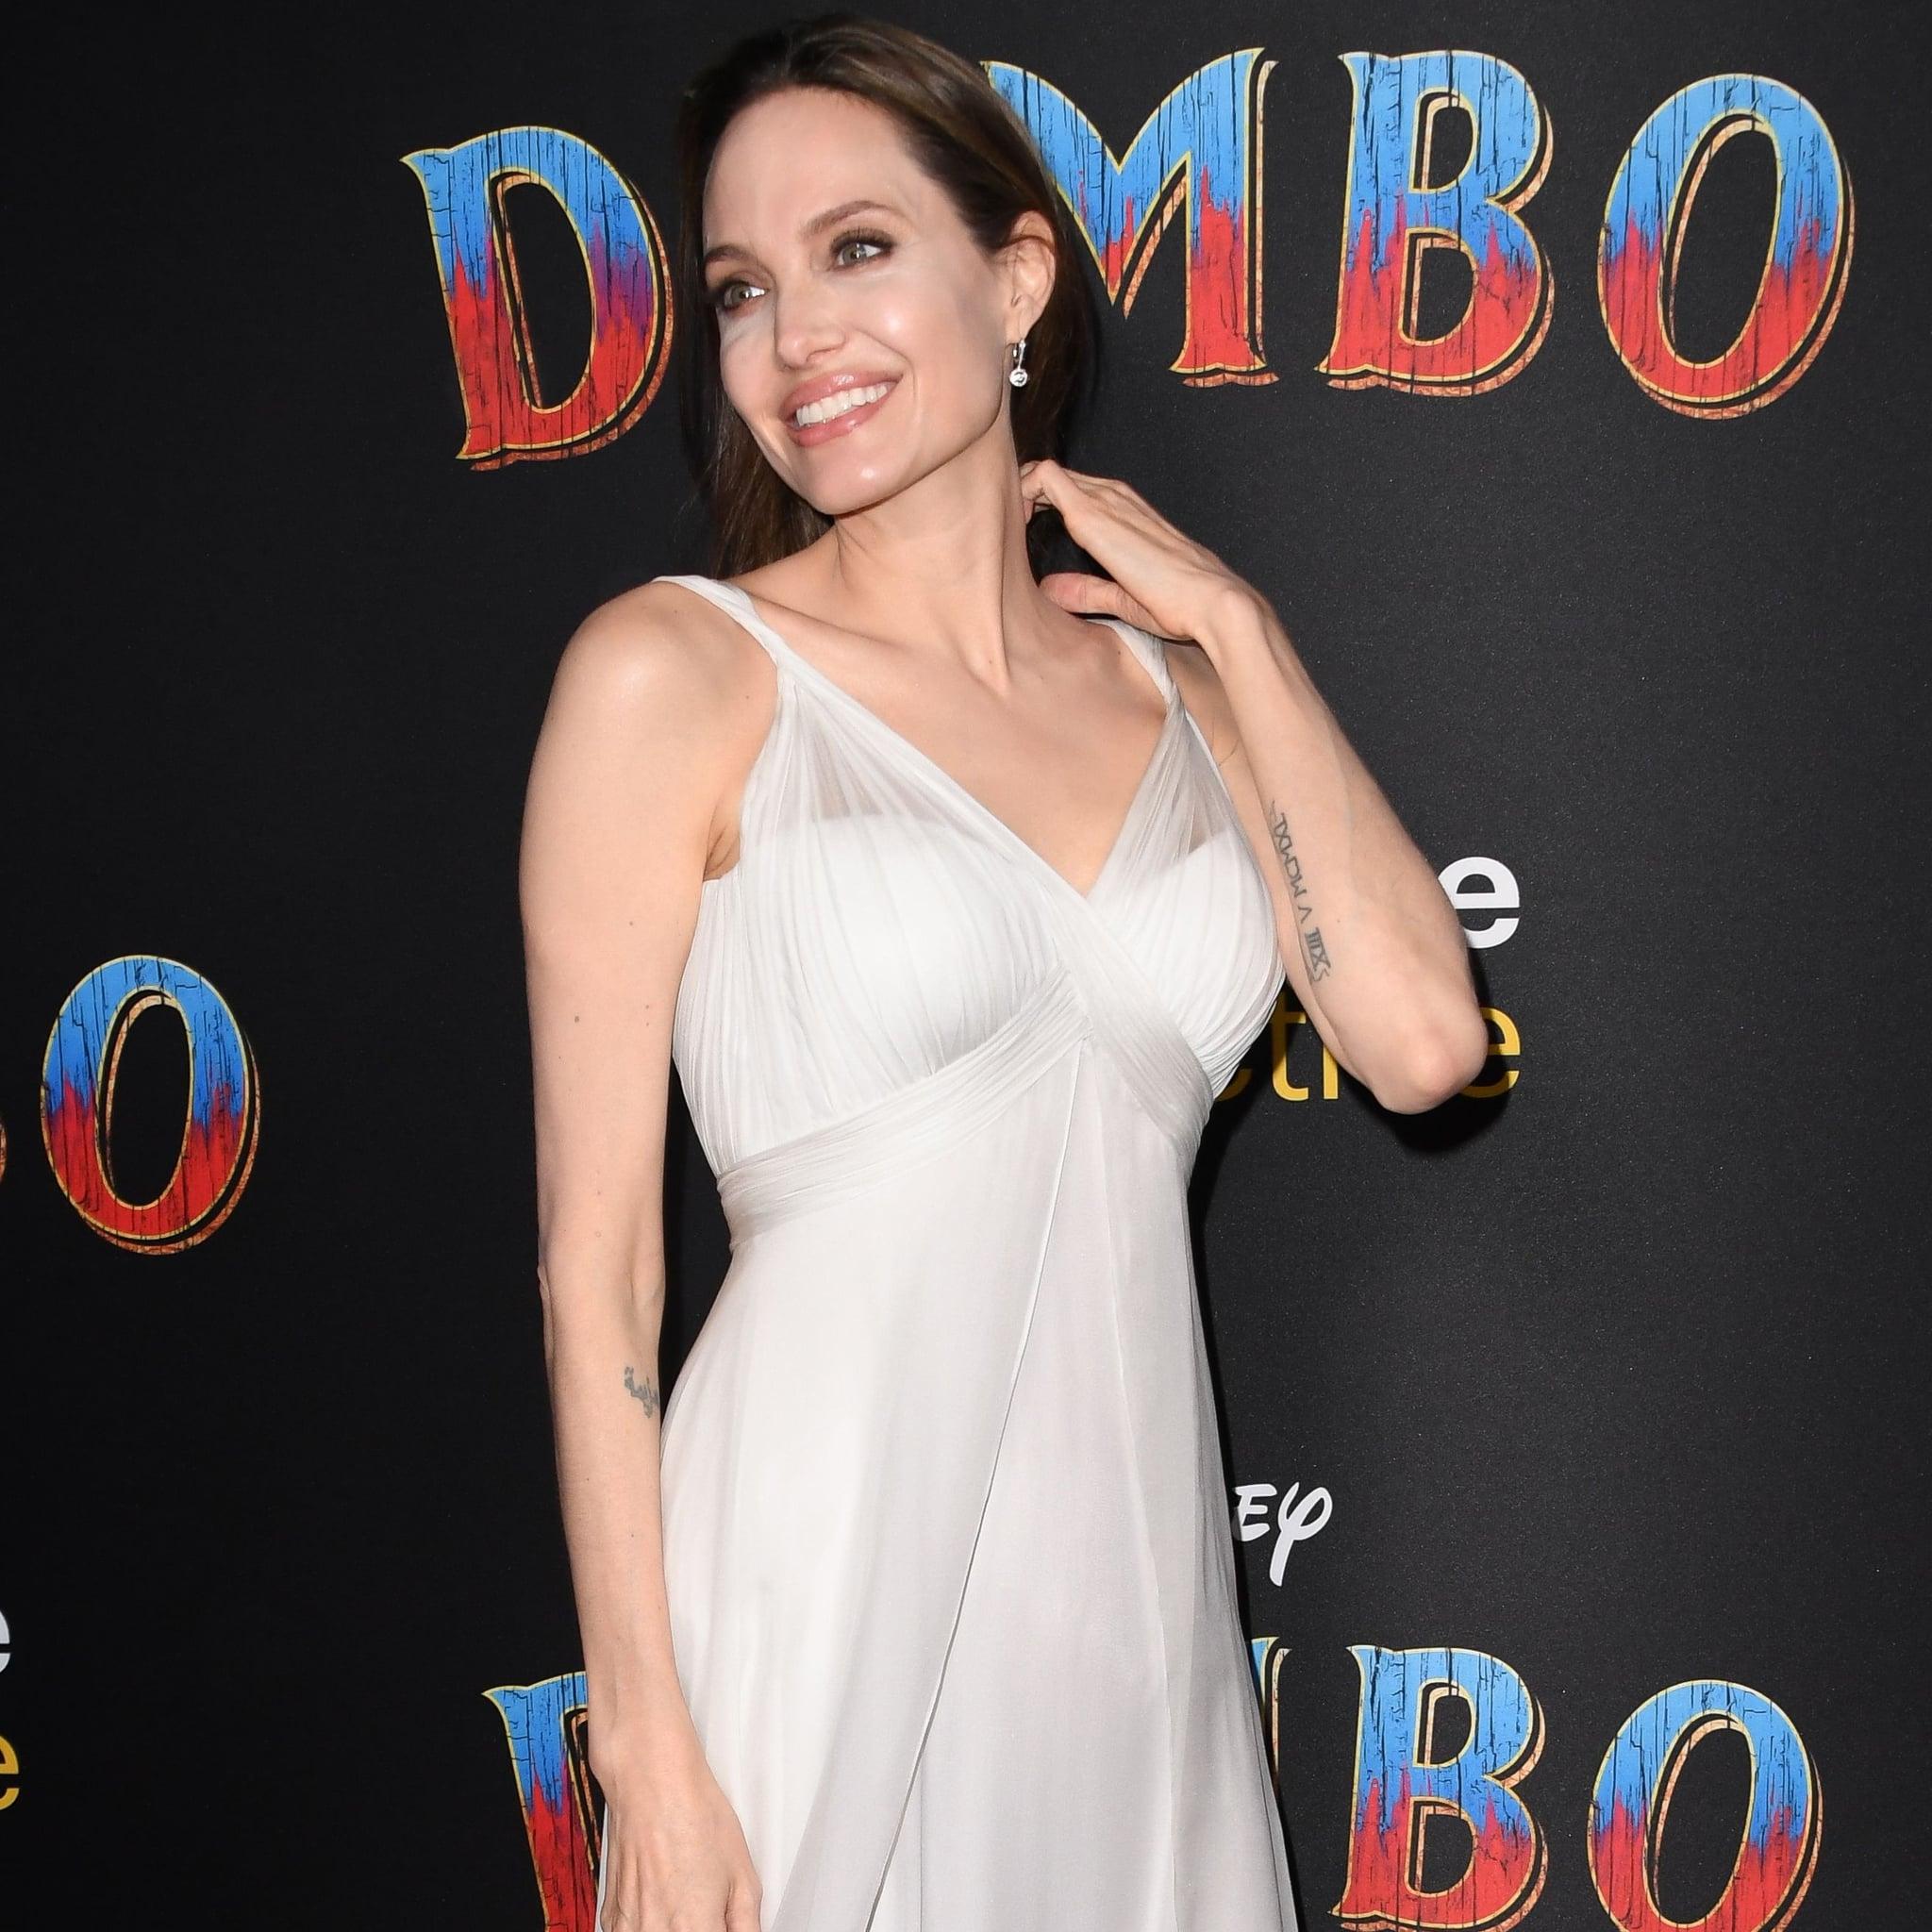 742b67358a7 Angelina Jolie Dress at Dumbo Premiere 2019